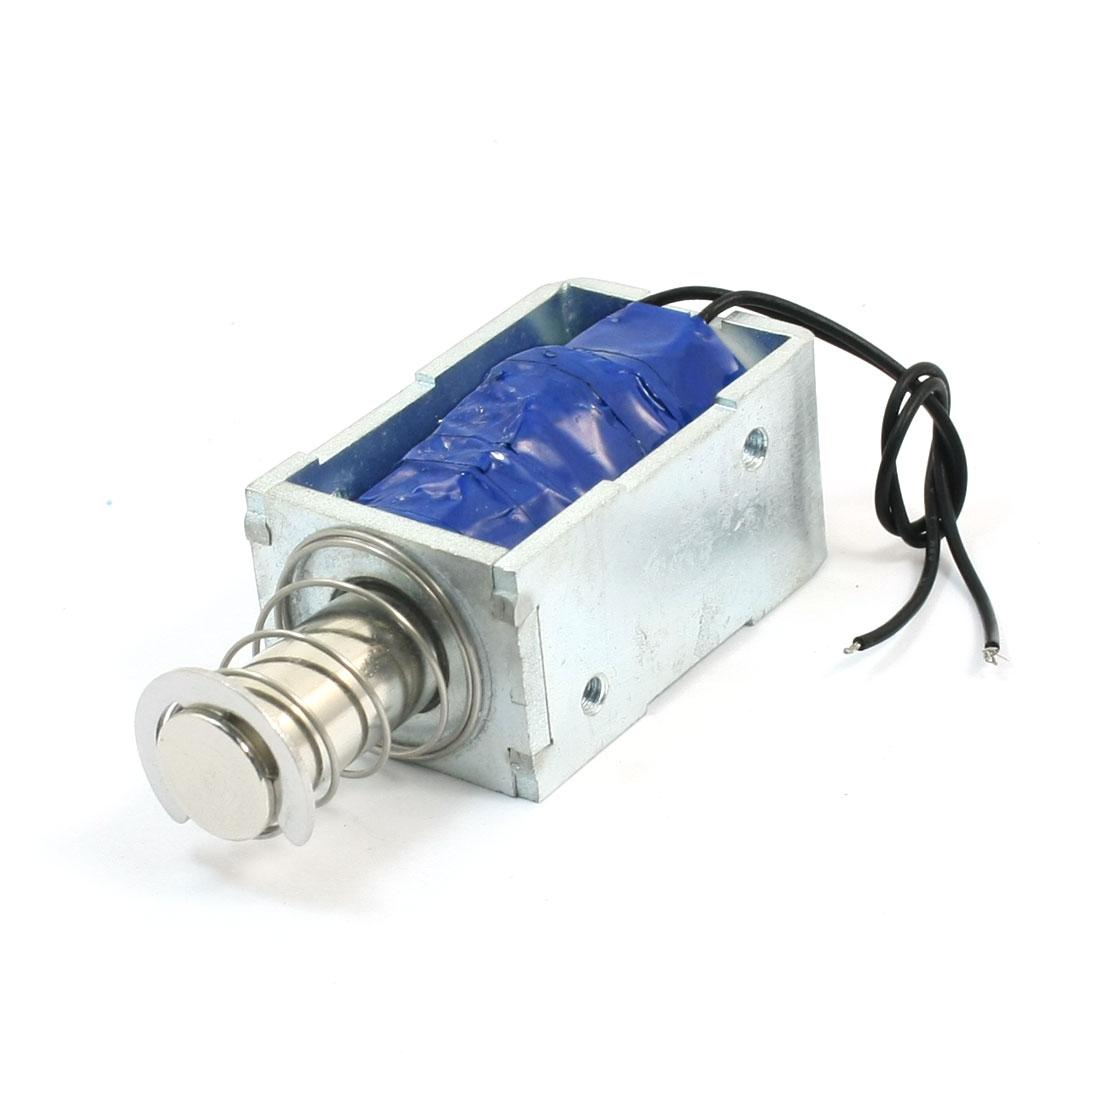 DC60V 10mm 3kg Actuator Pull Type Linear Motion Solenoid Electromagnet